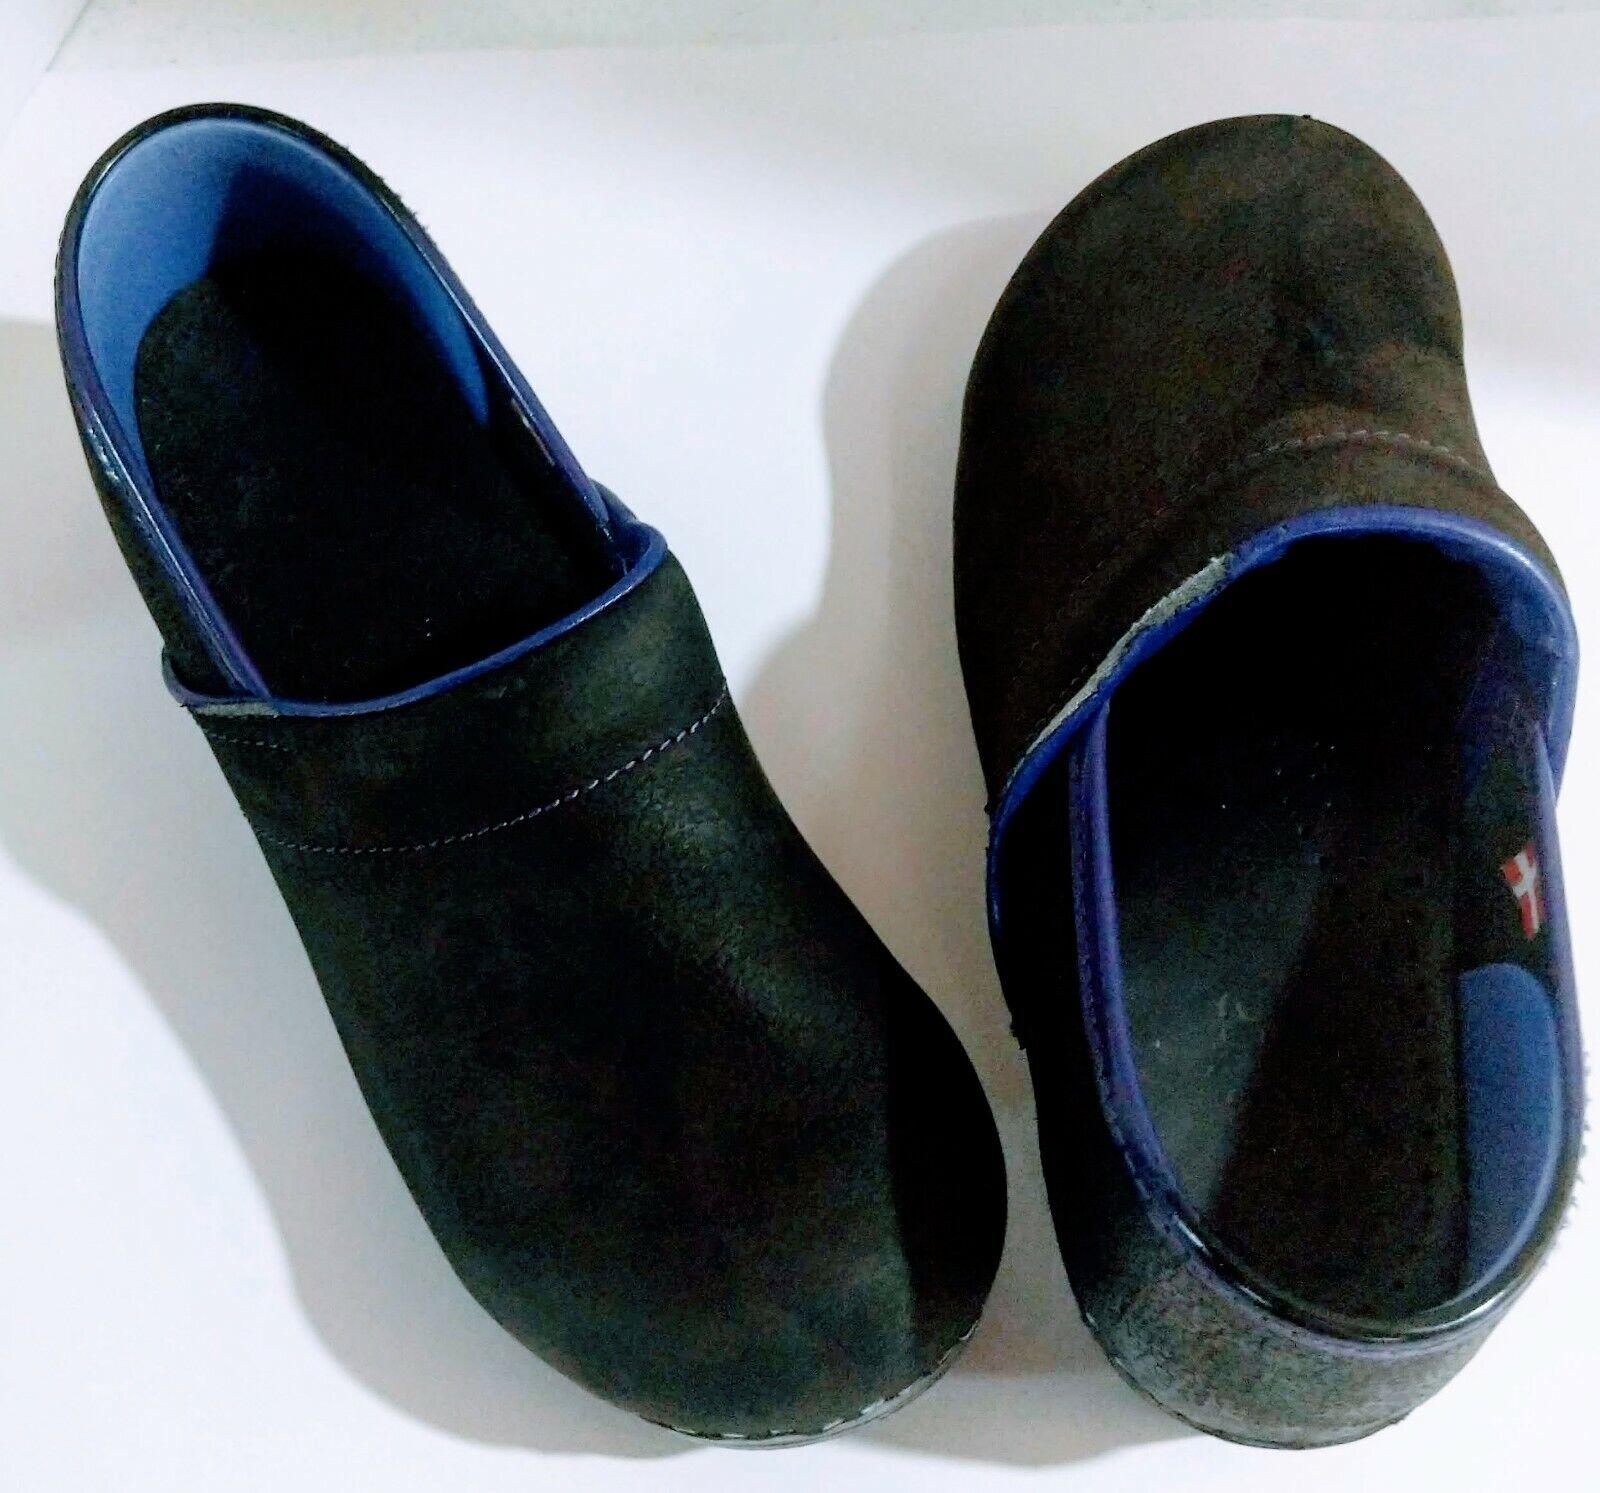 SANITA Dark Blue Leather Professional Clogs Size 40 US 9.5 *Flaws Read